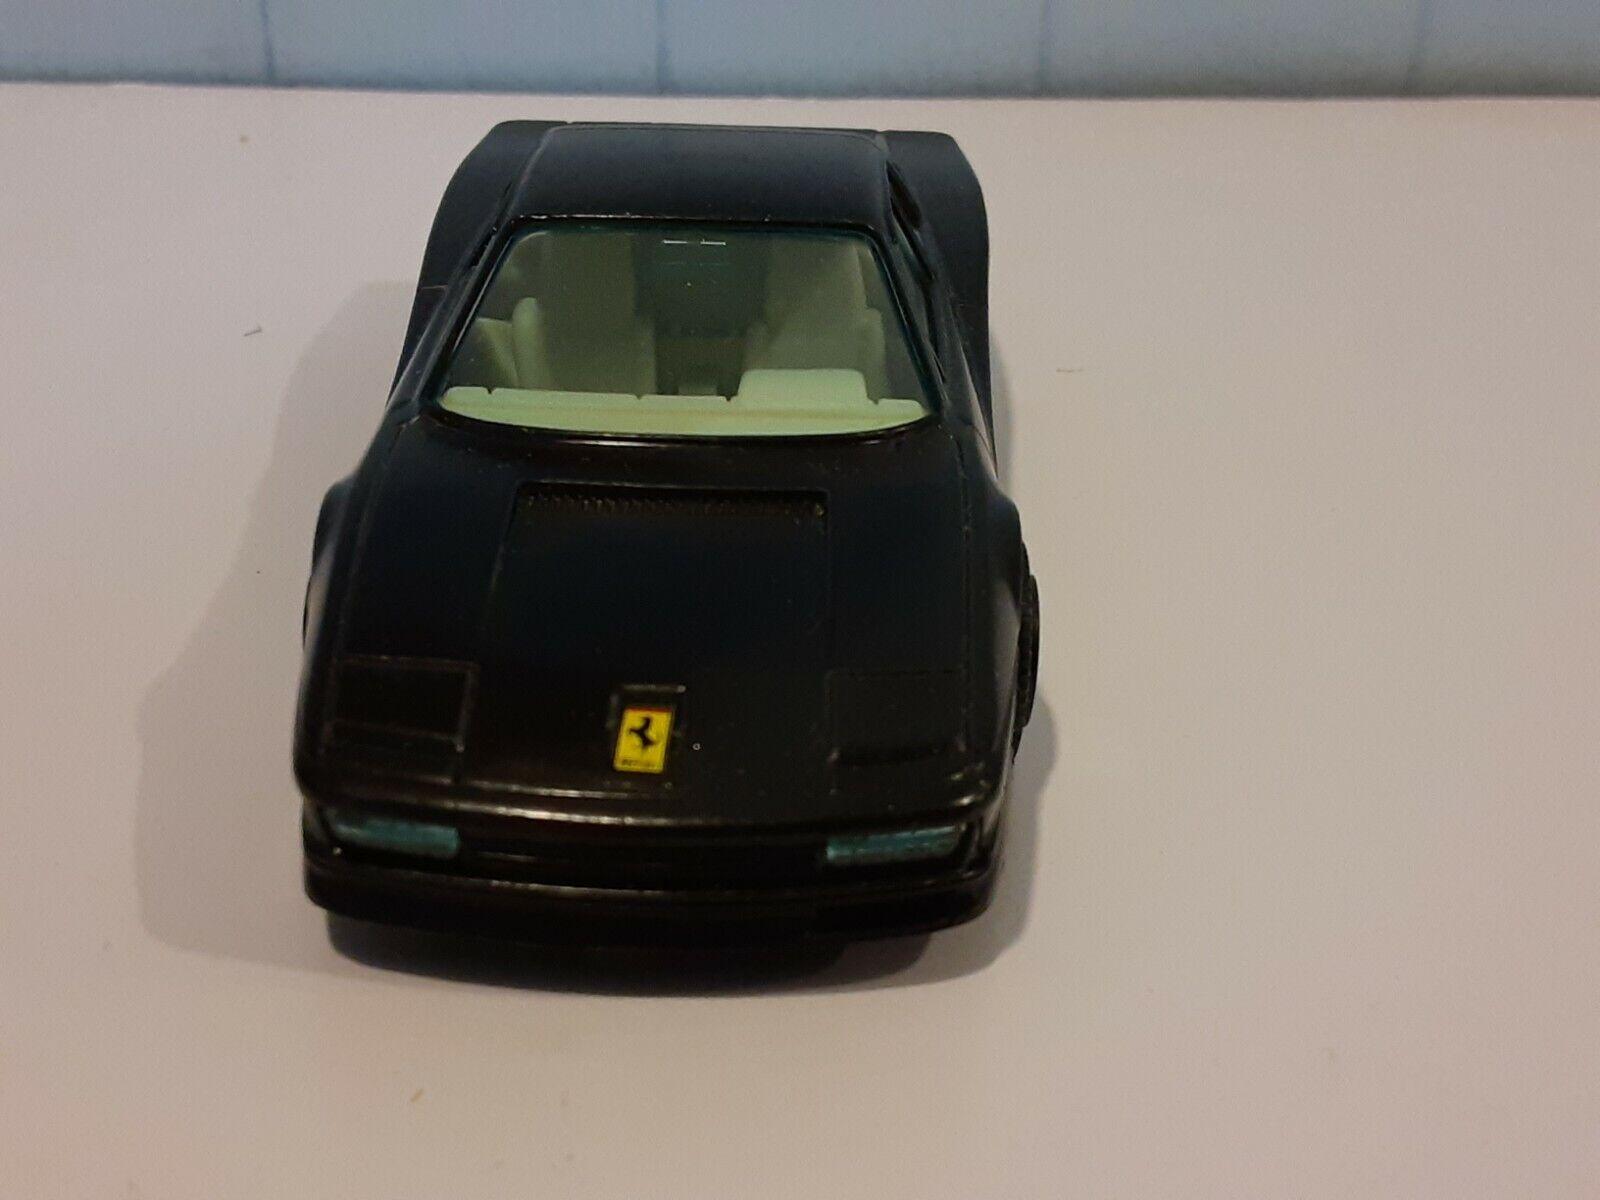 Burago Ferrari Testarossa Extremely rare Collectible chrome Plated Keyring 1:87